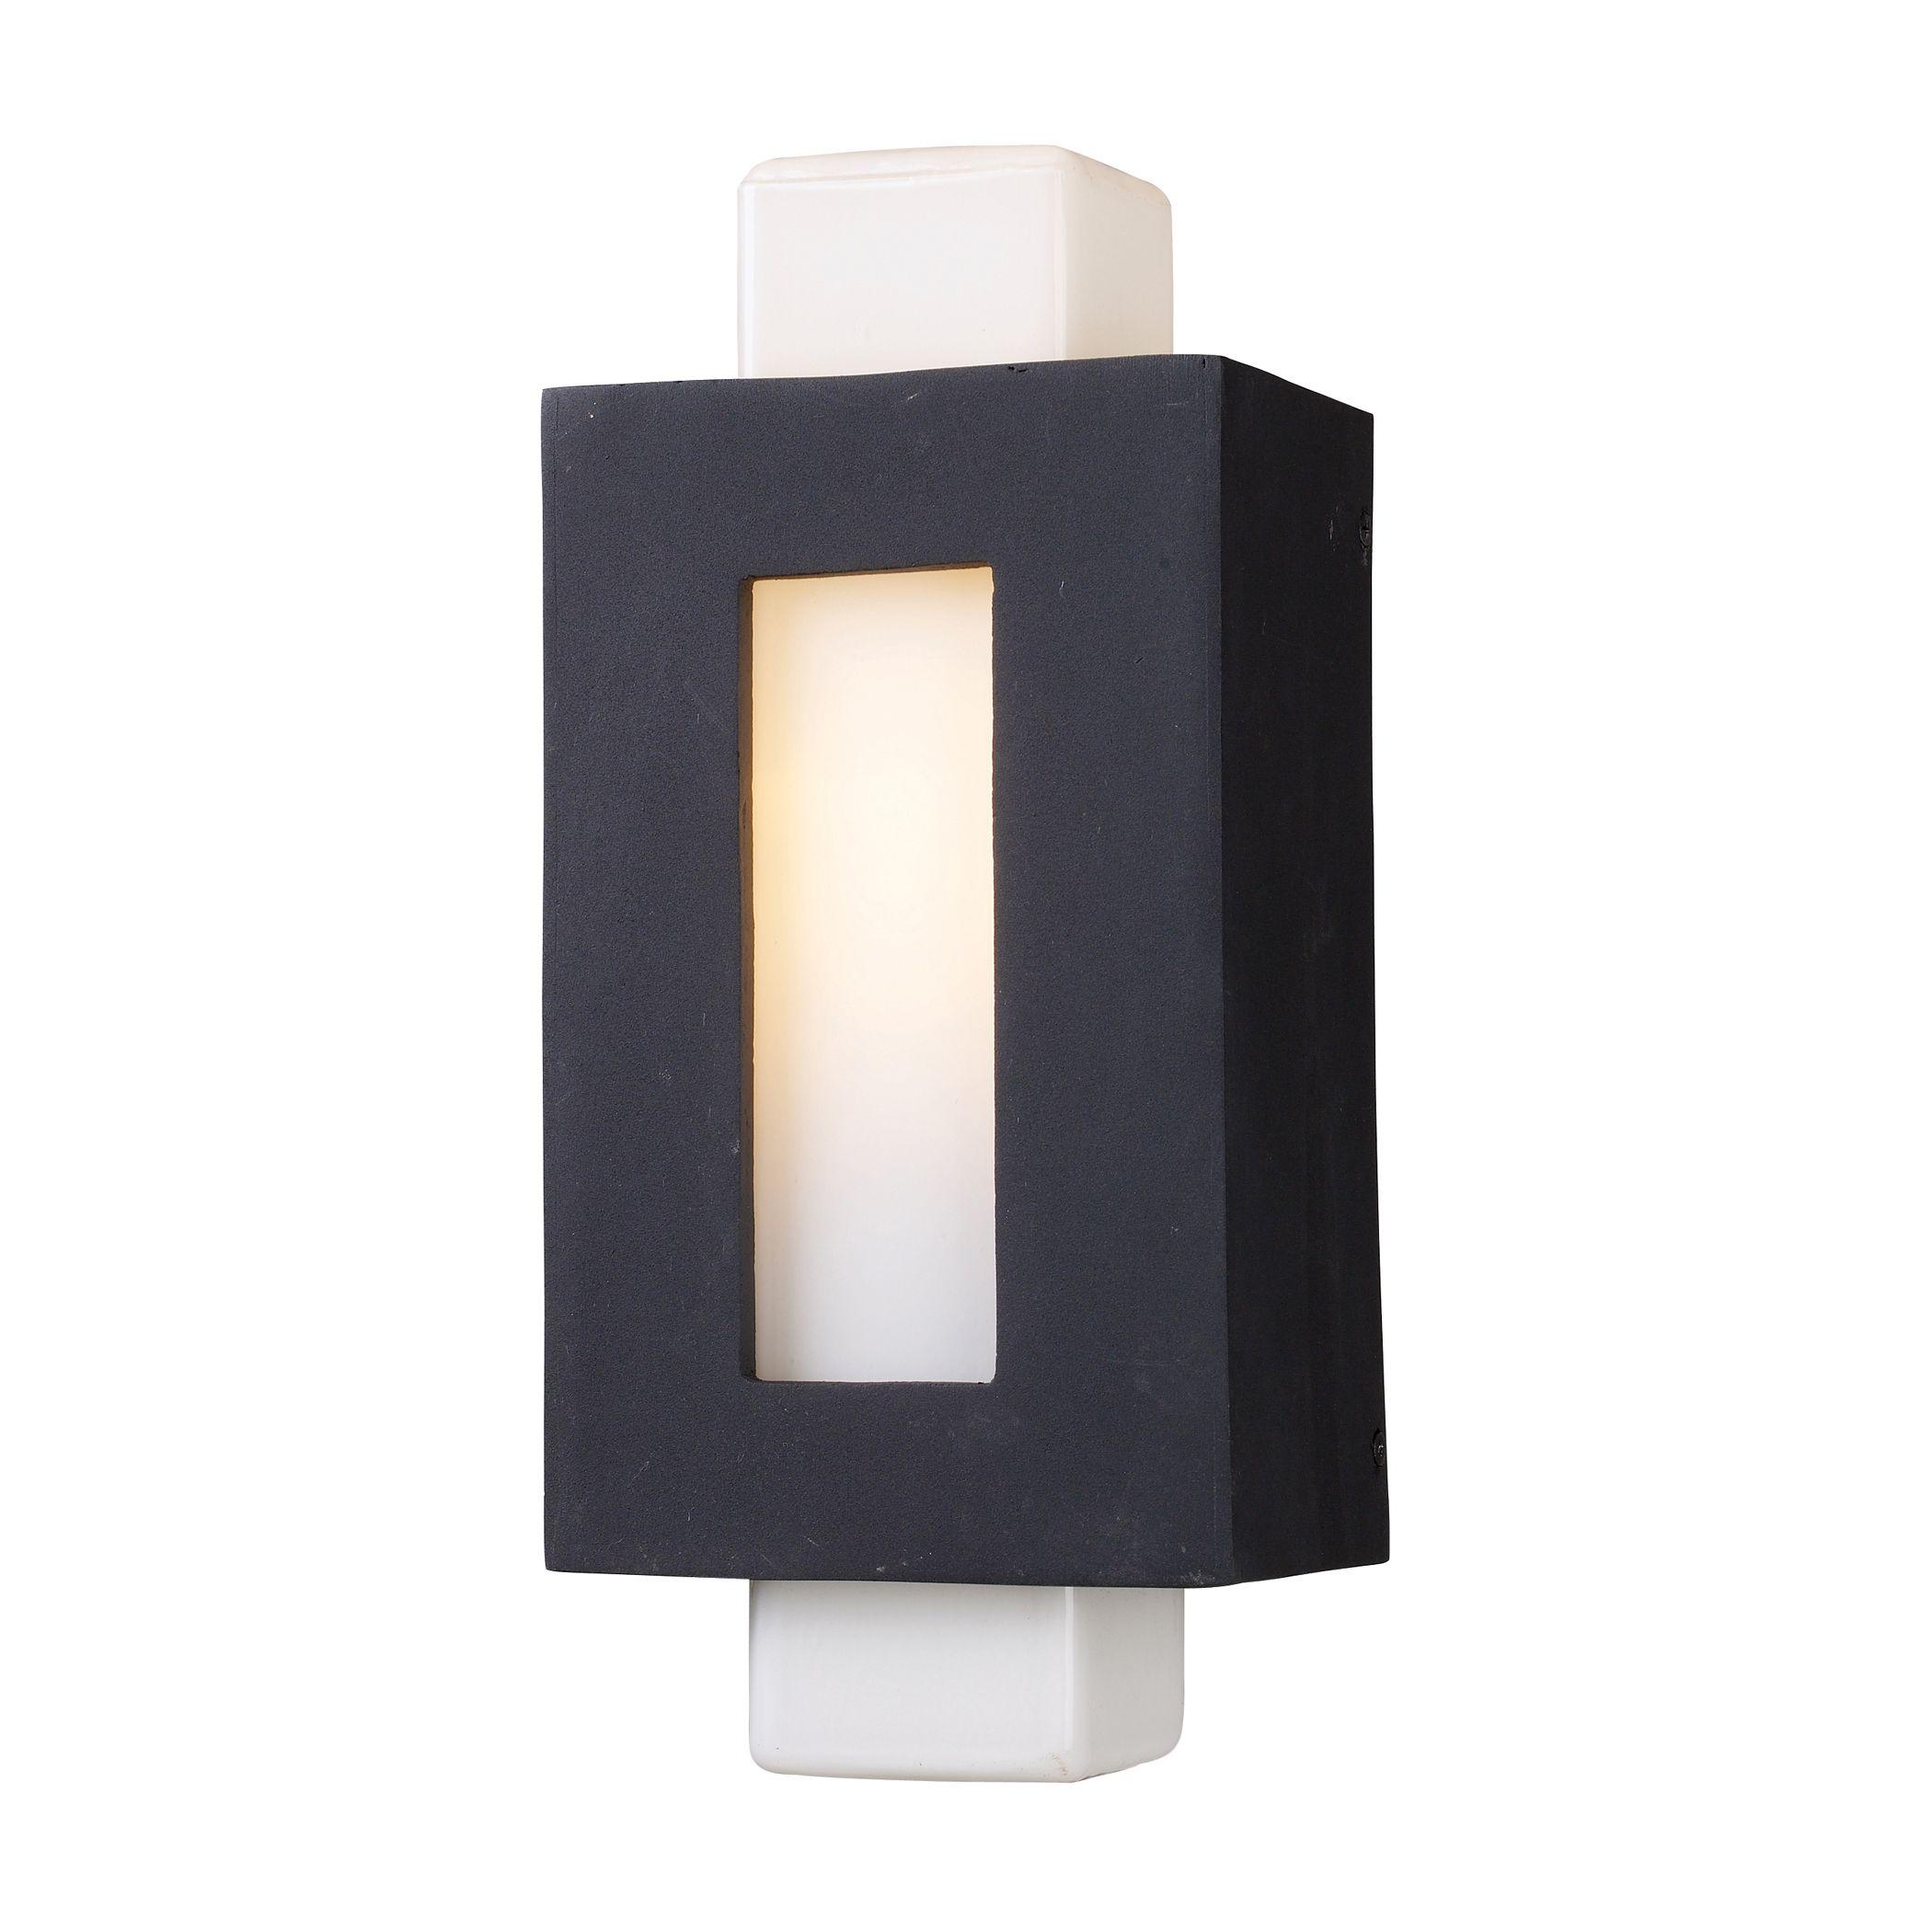 42195/1 Sundborn 1-Light Sconce in Matte Black